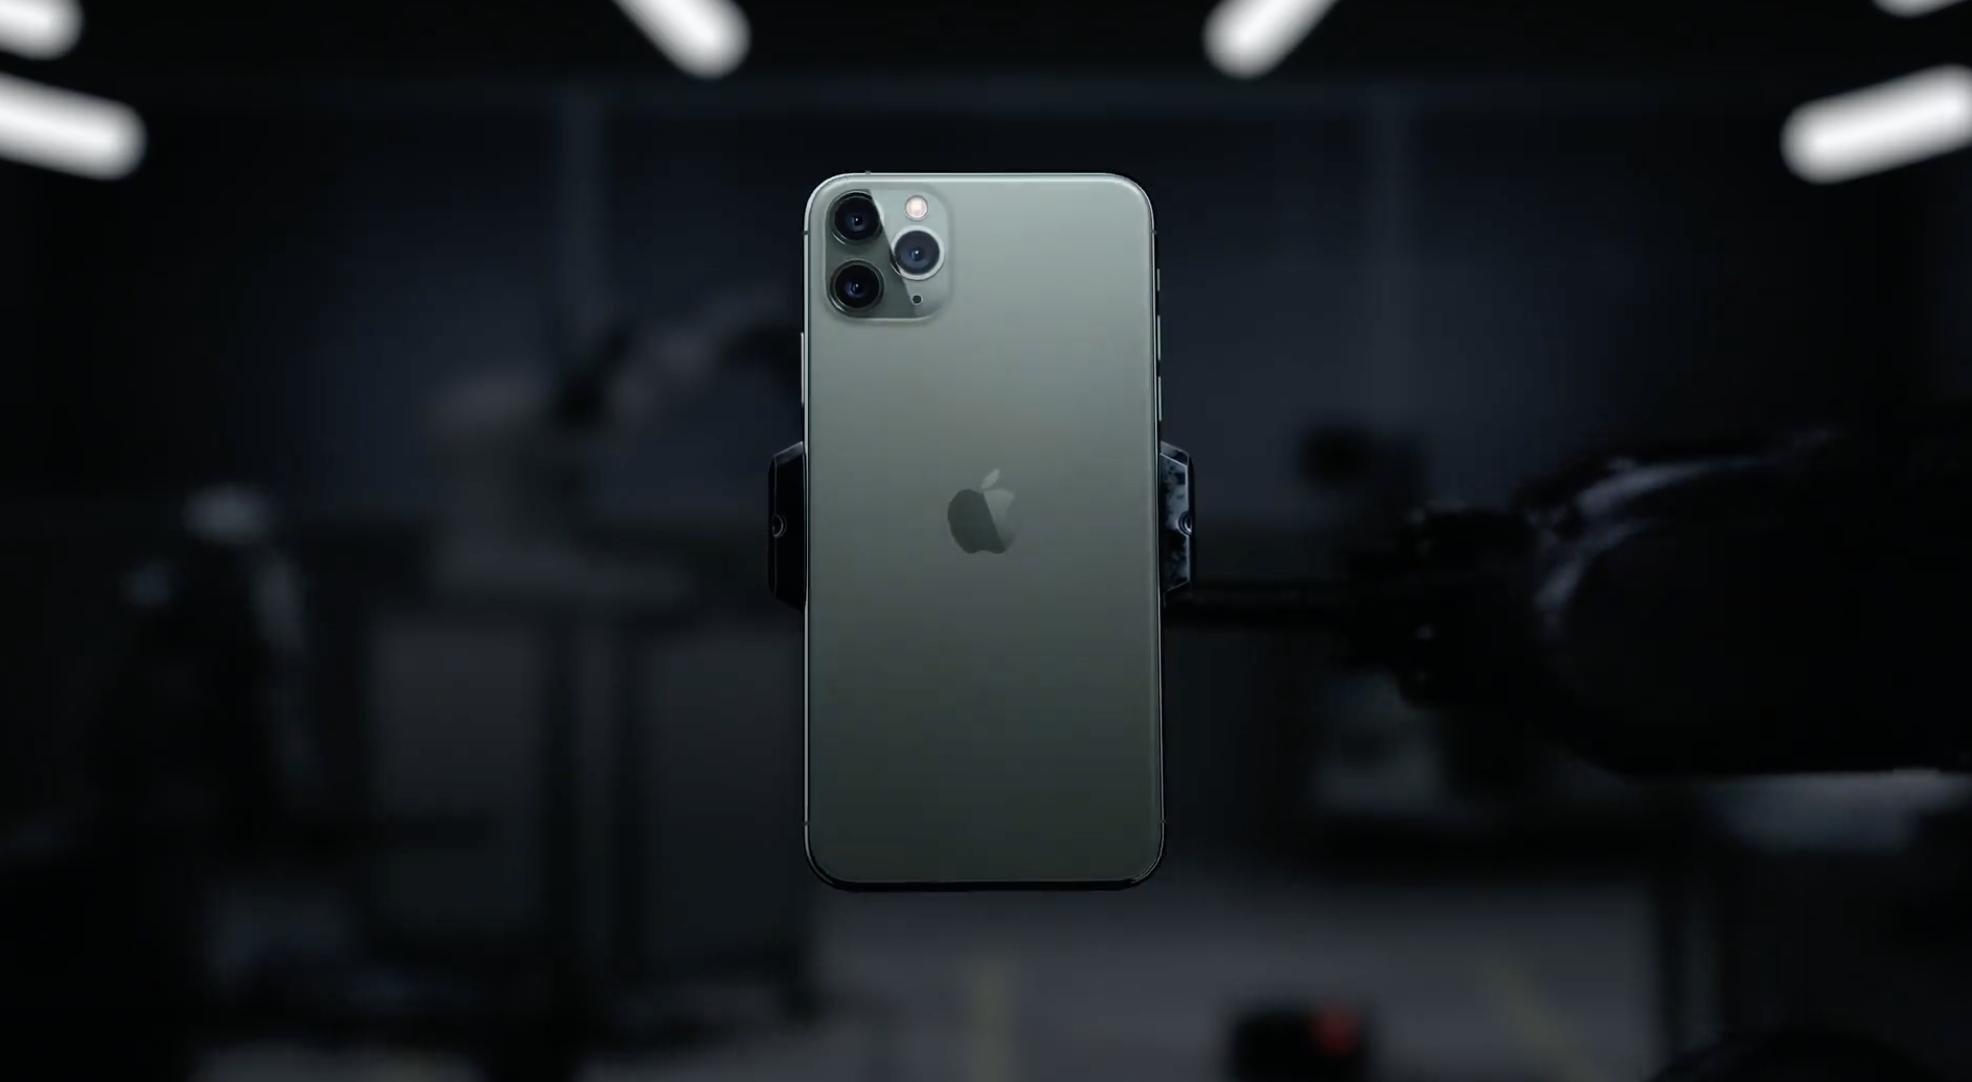 traseira da apple iphone 11 pro